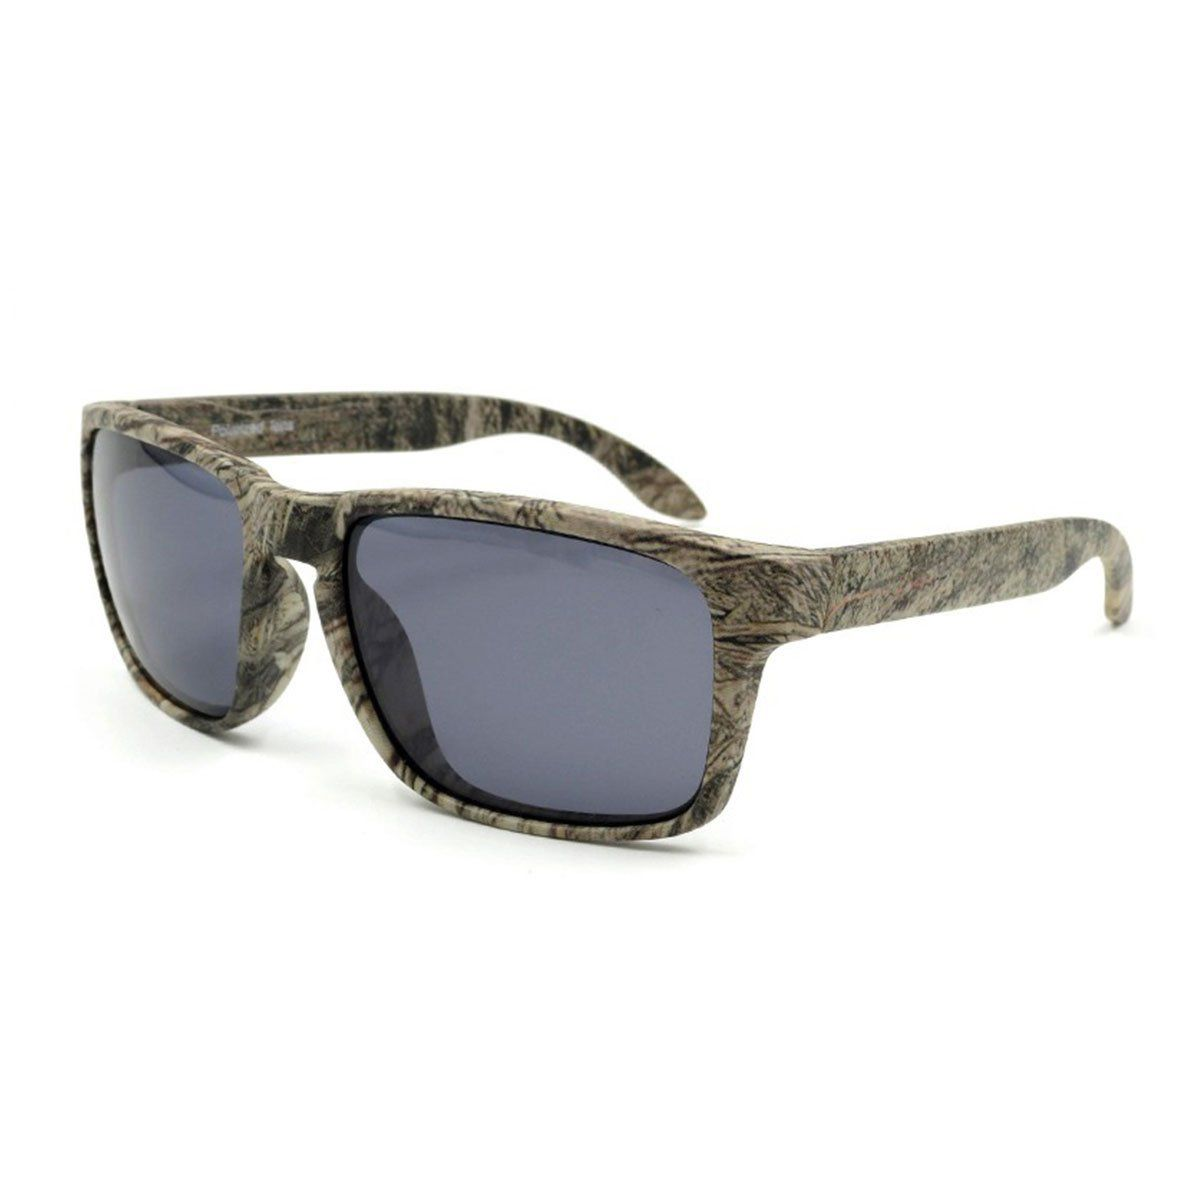 Oculos Polarizado Pro Tsuri Infinity Armacao Real Tree Camo - Lente Fume